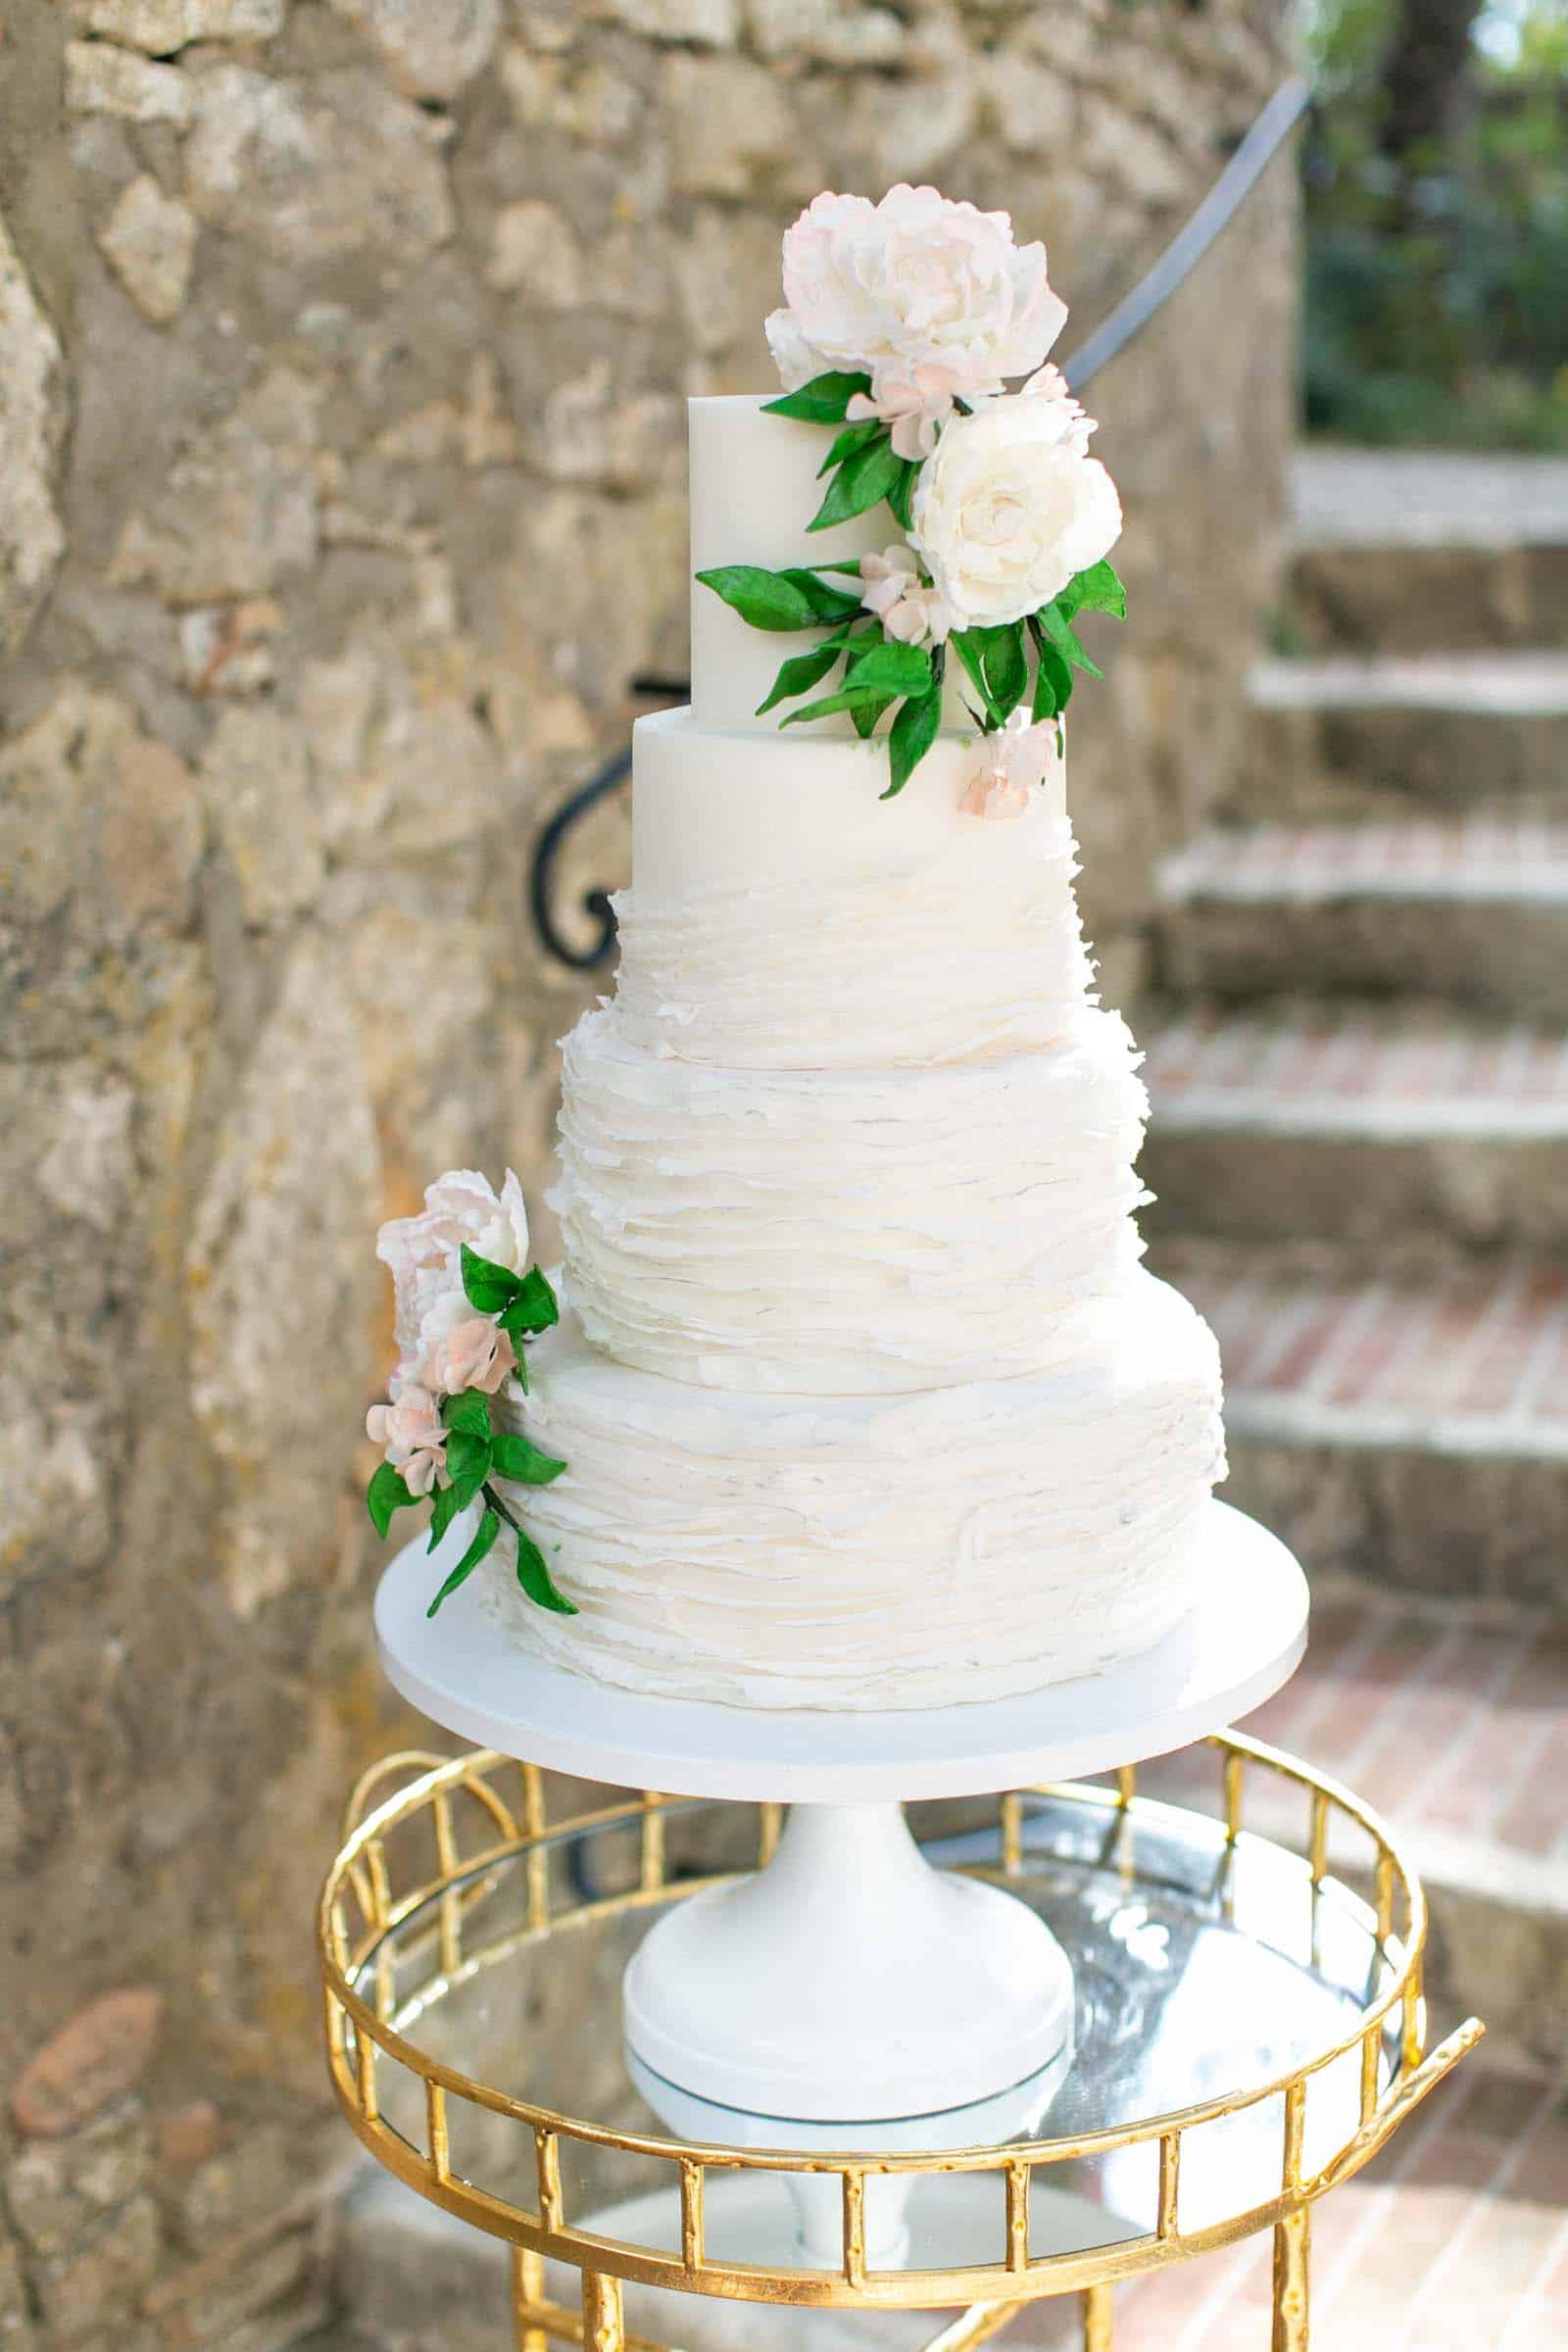 Romantic tiered Cake by Florence Italy Cake Designer Melanie Secciani at Borgo Pignano